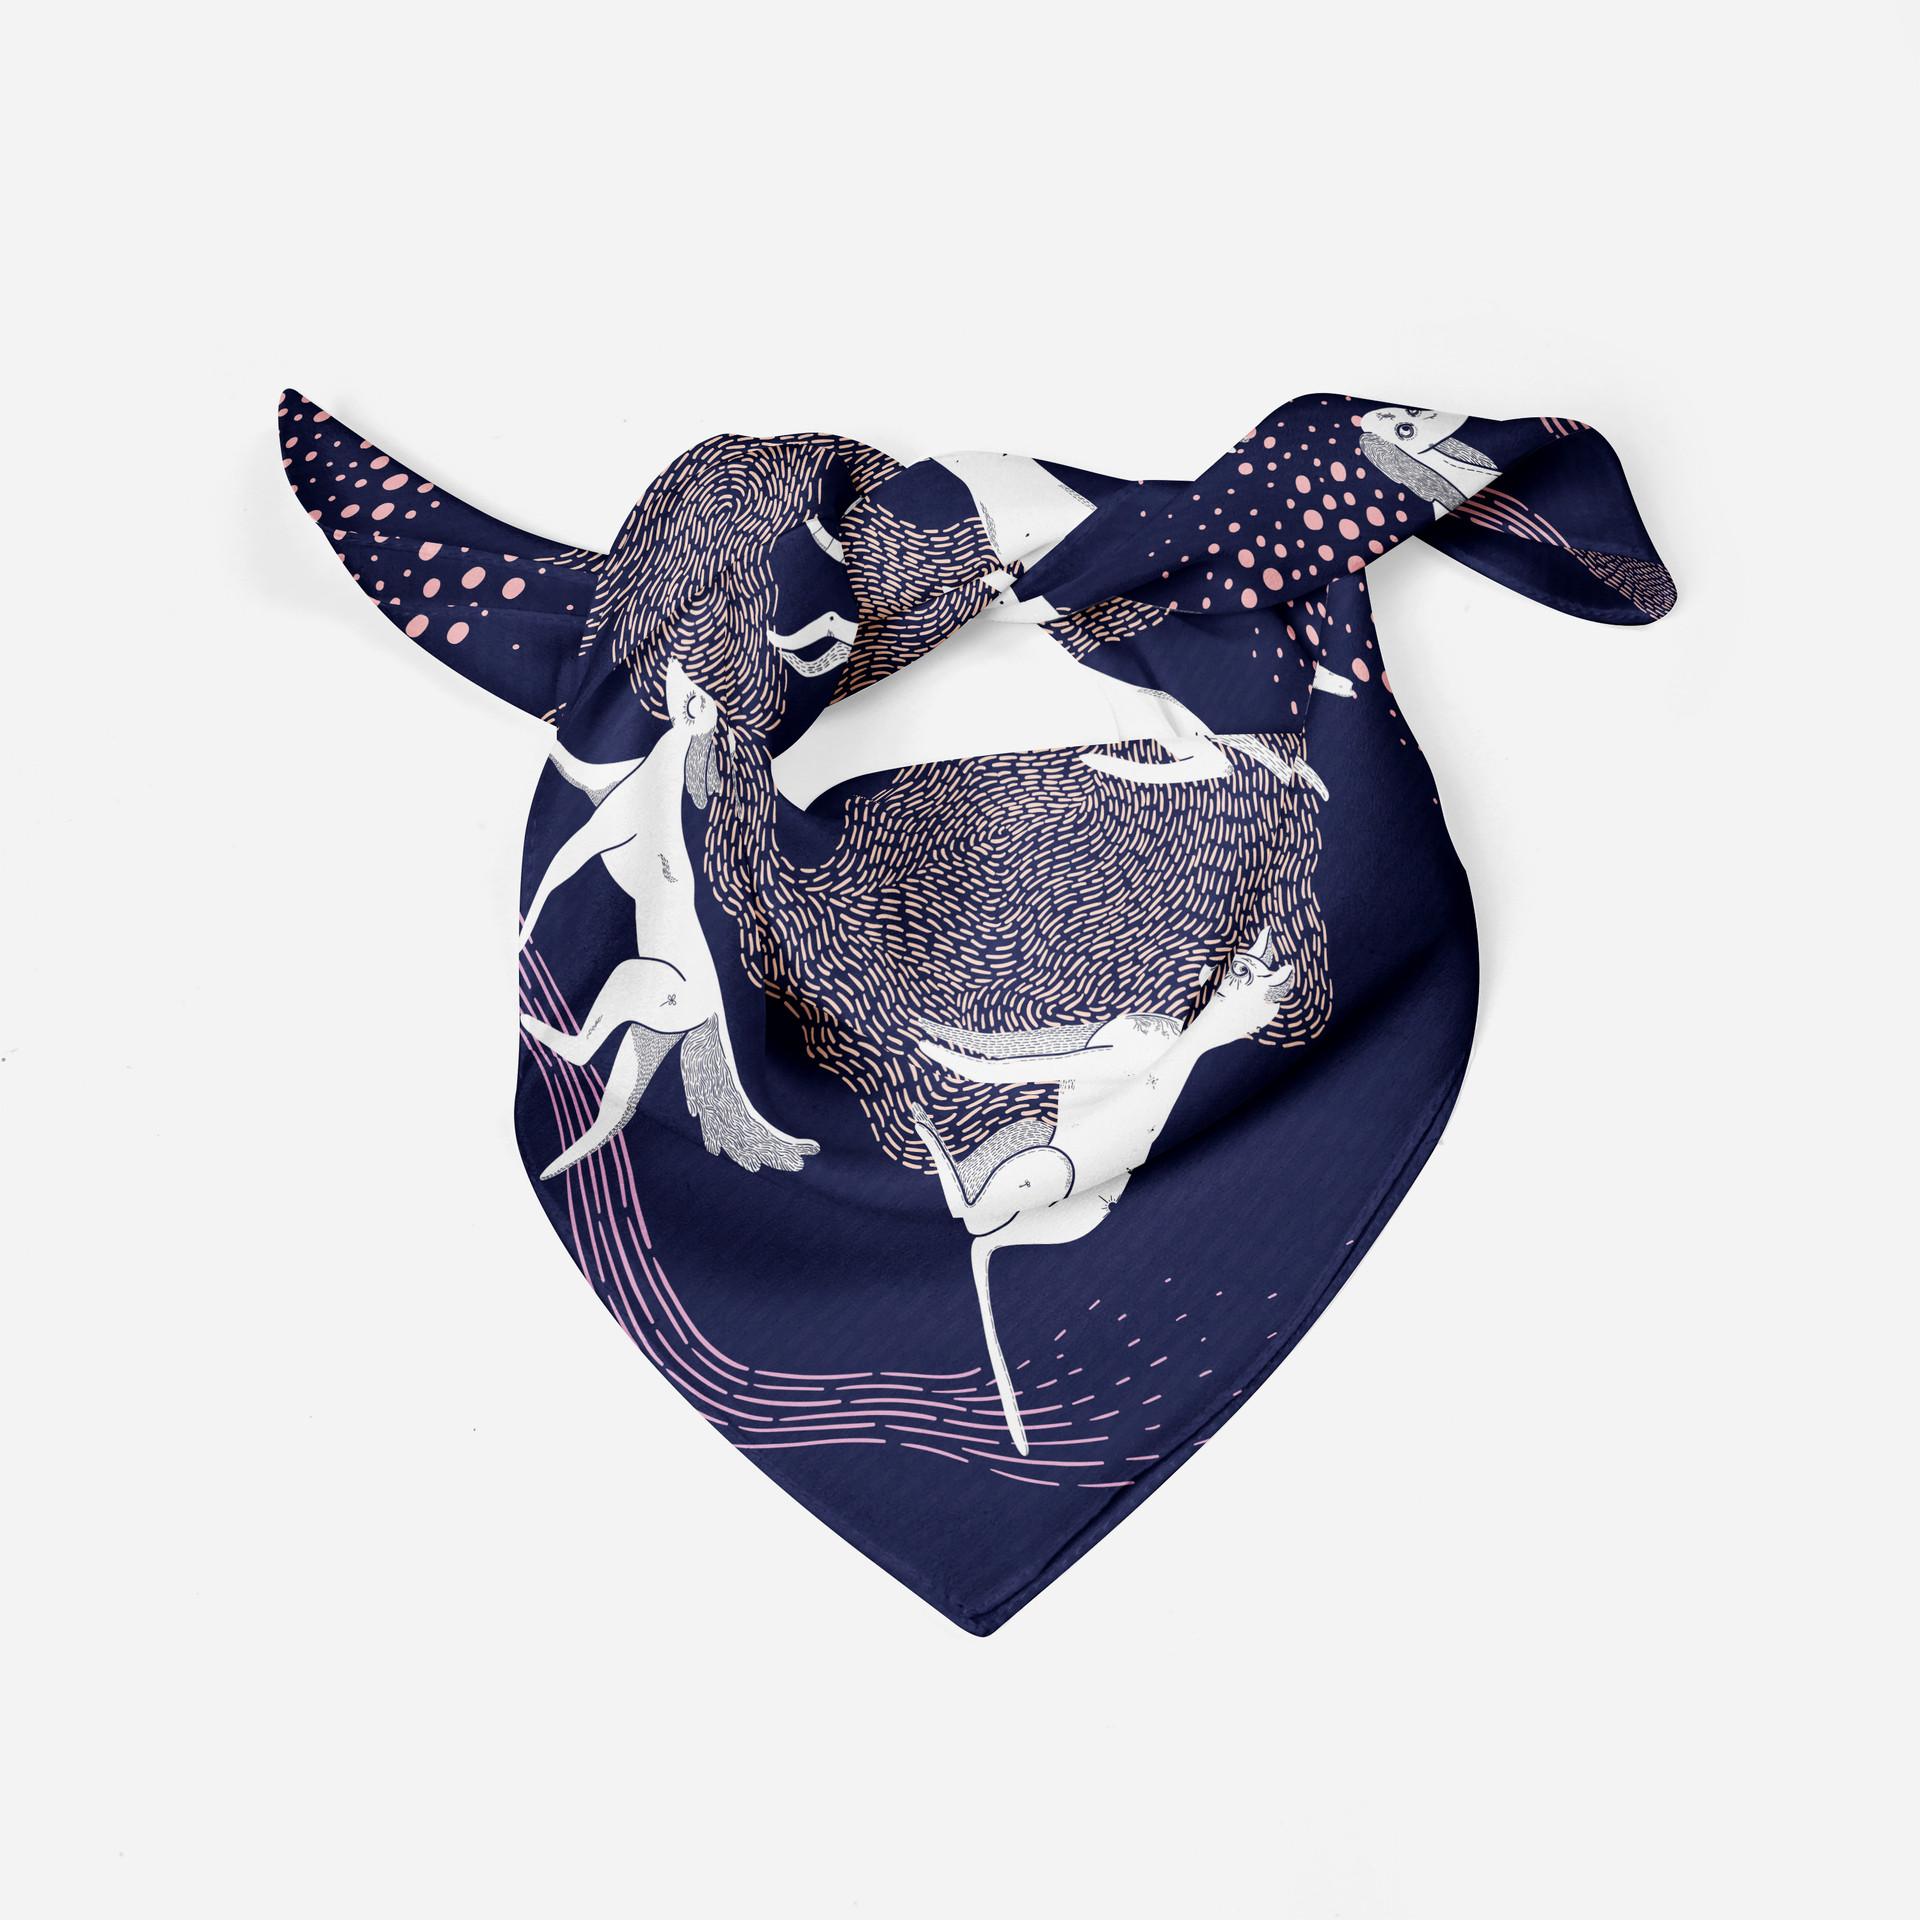 spirit dog scarf 2.jpg